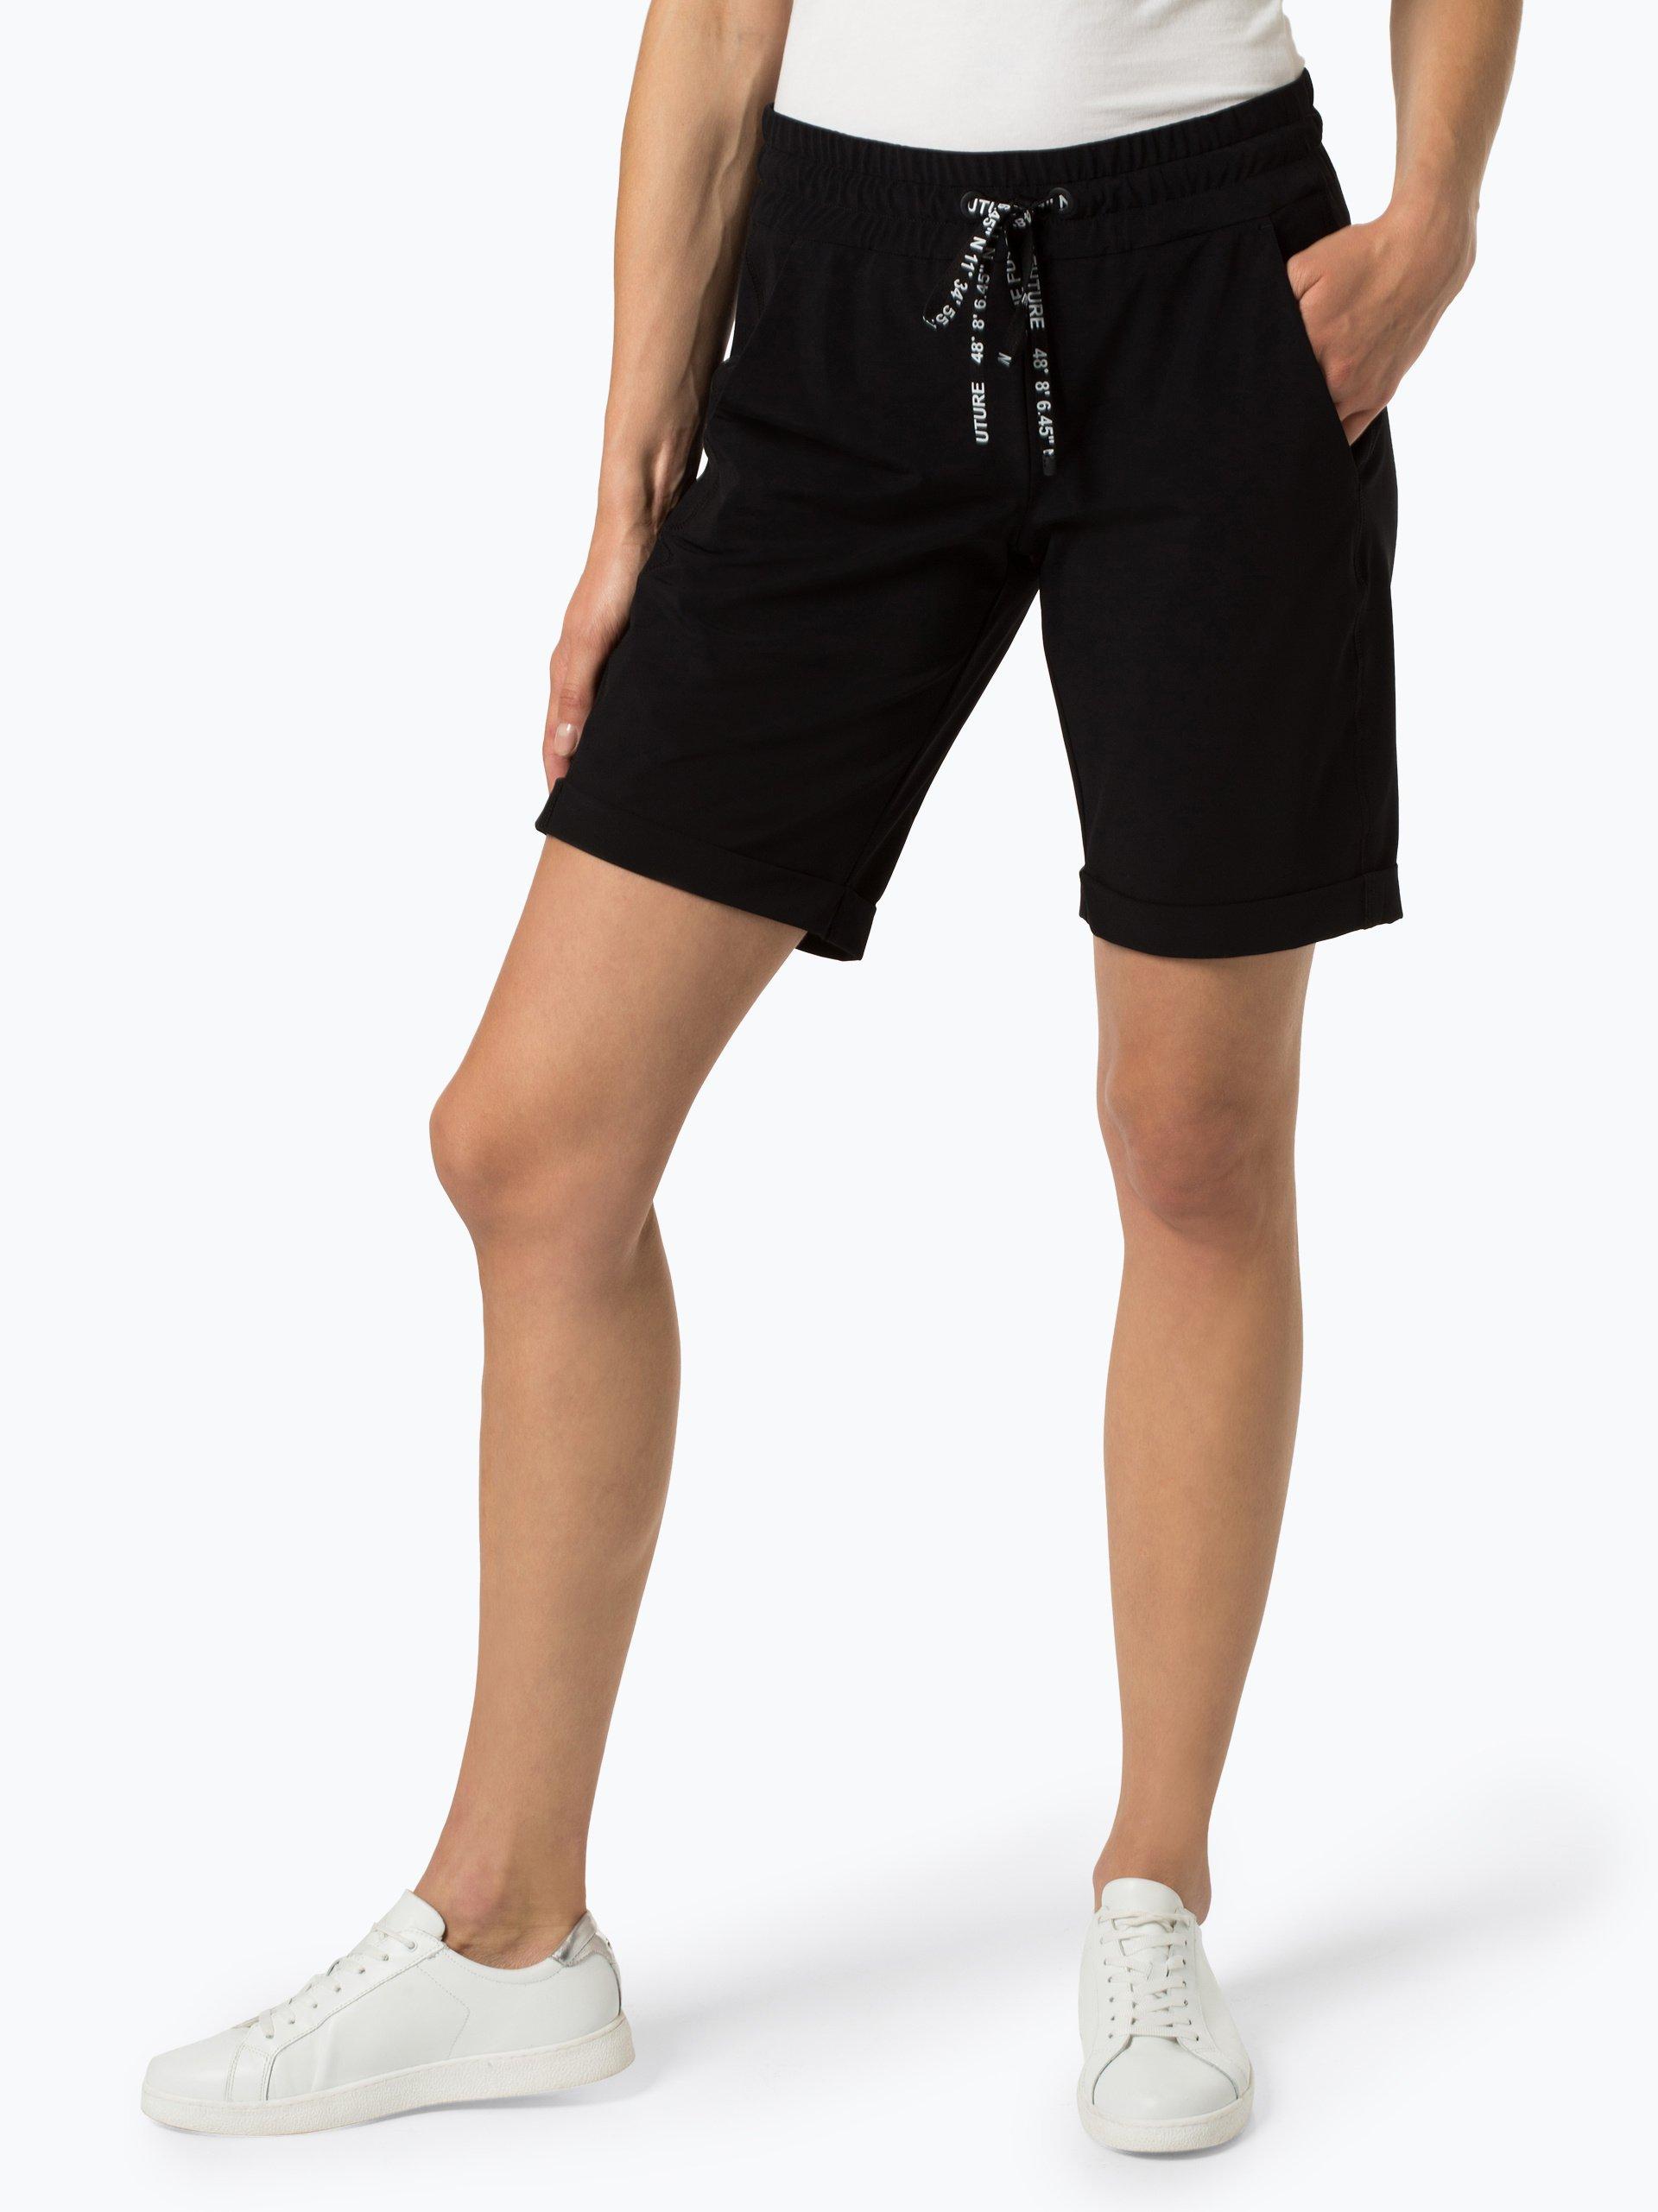 Cambio Damen Shorts - Jullian